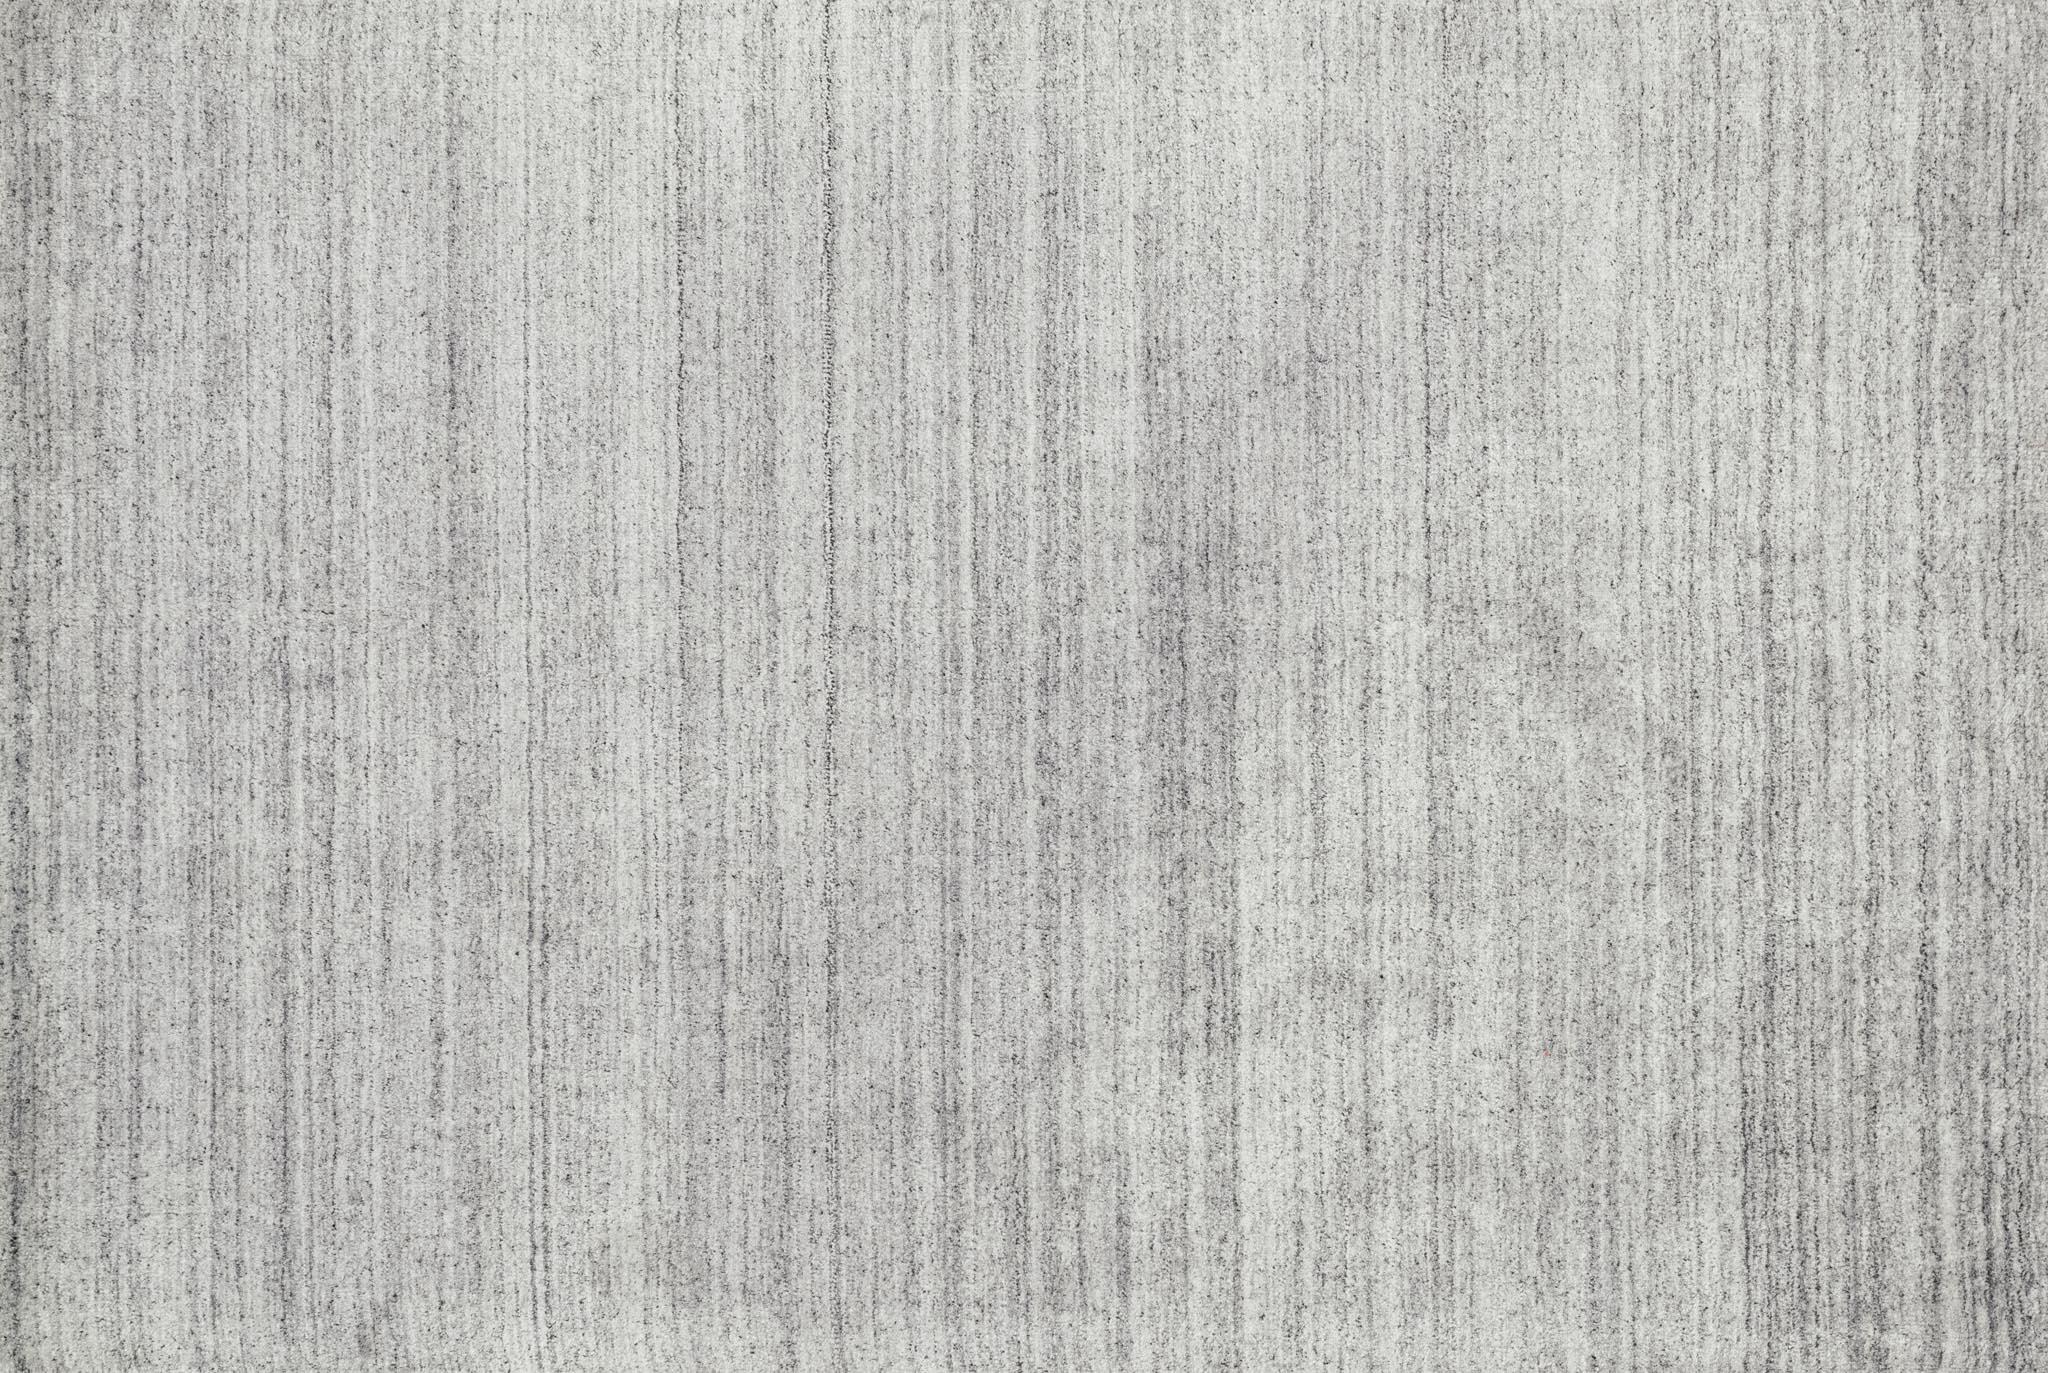 Loloi Barkley Bk 01 Silver Rug